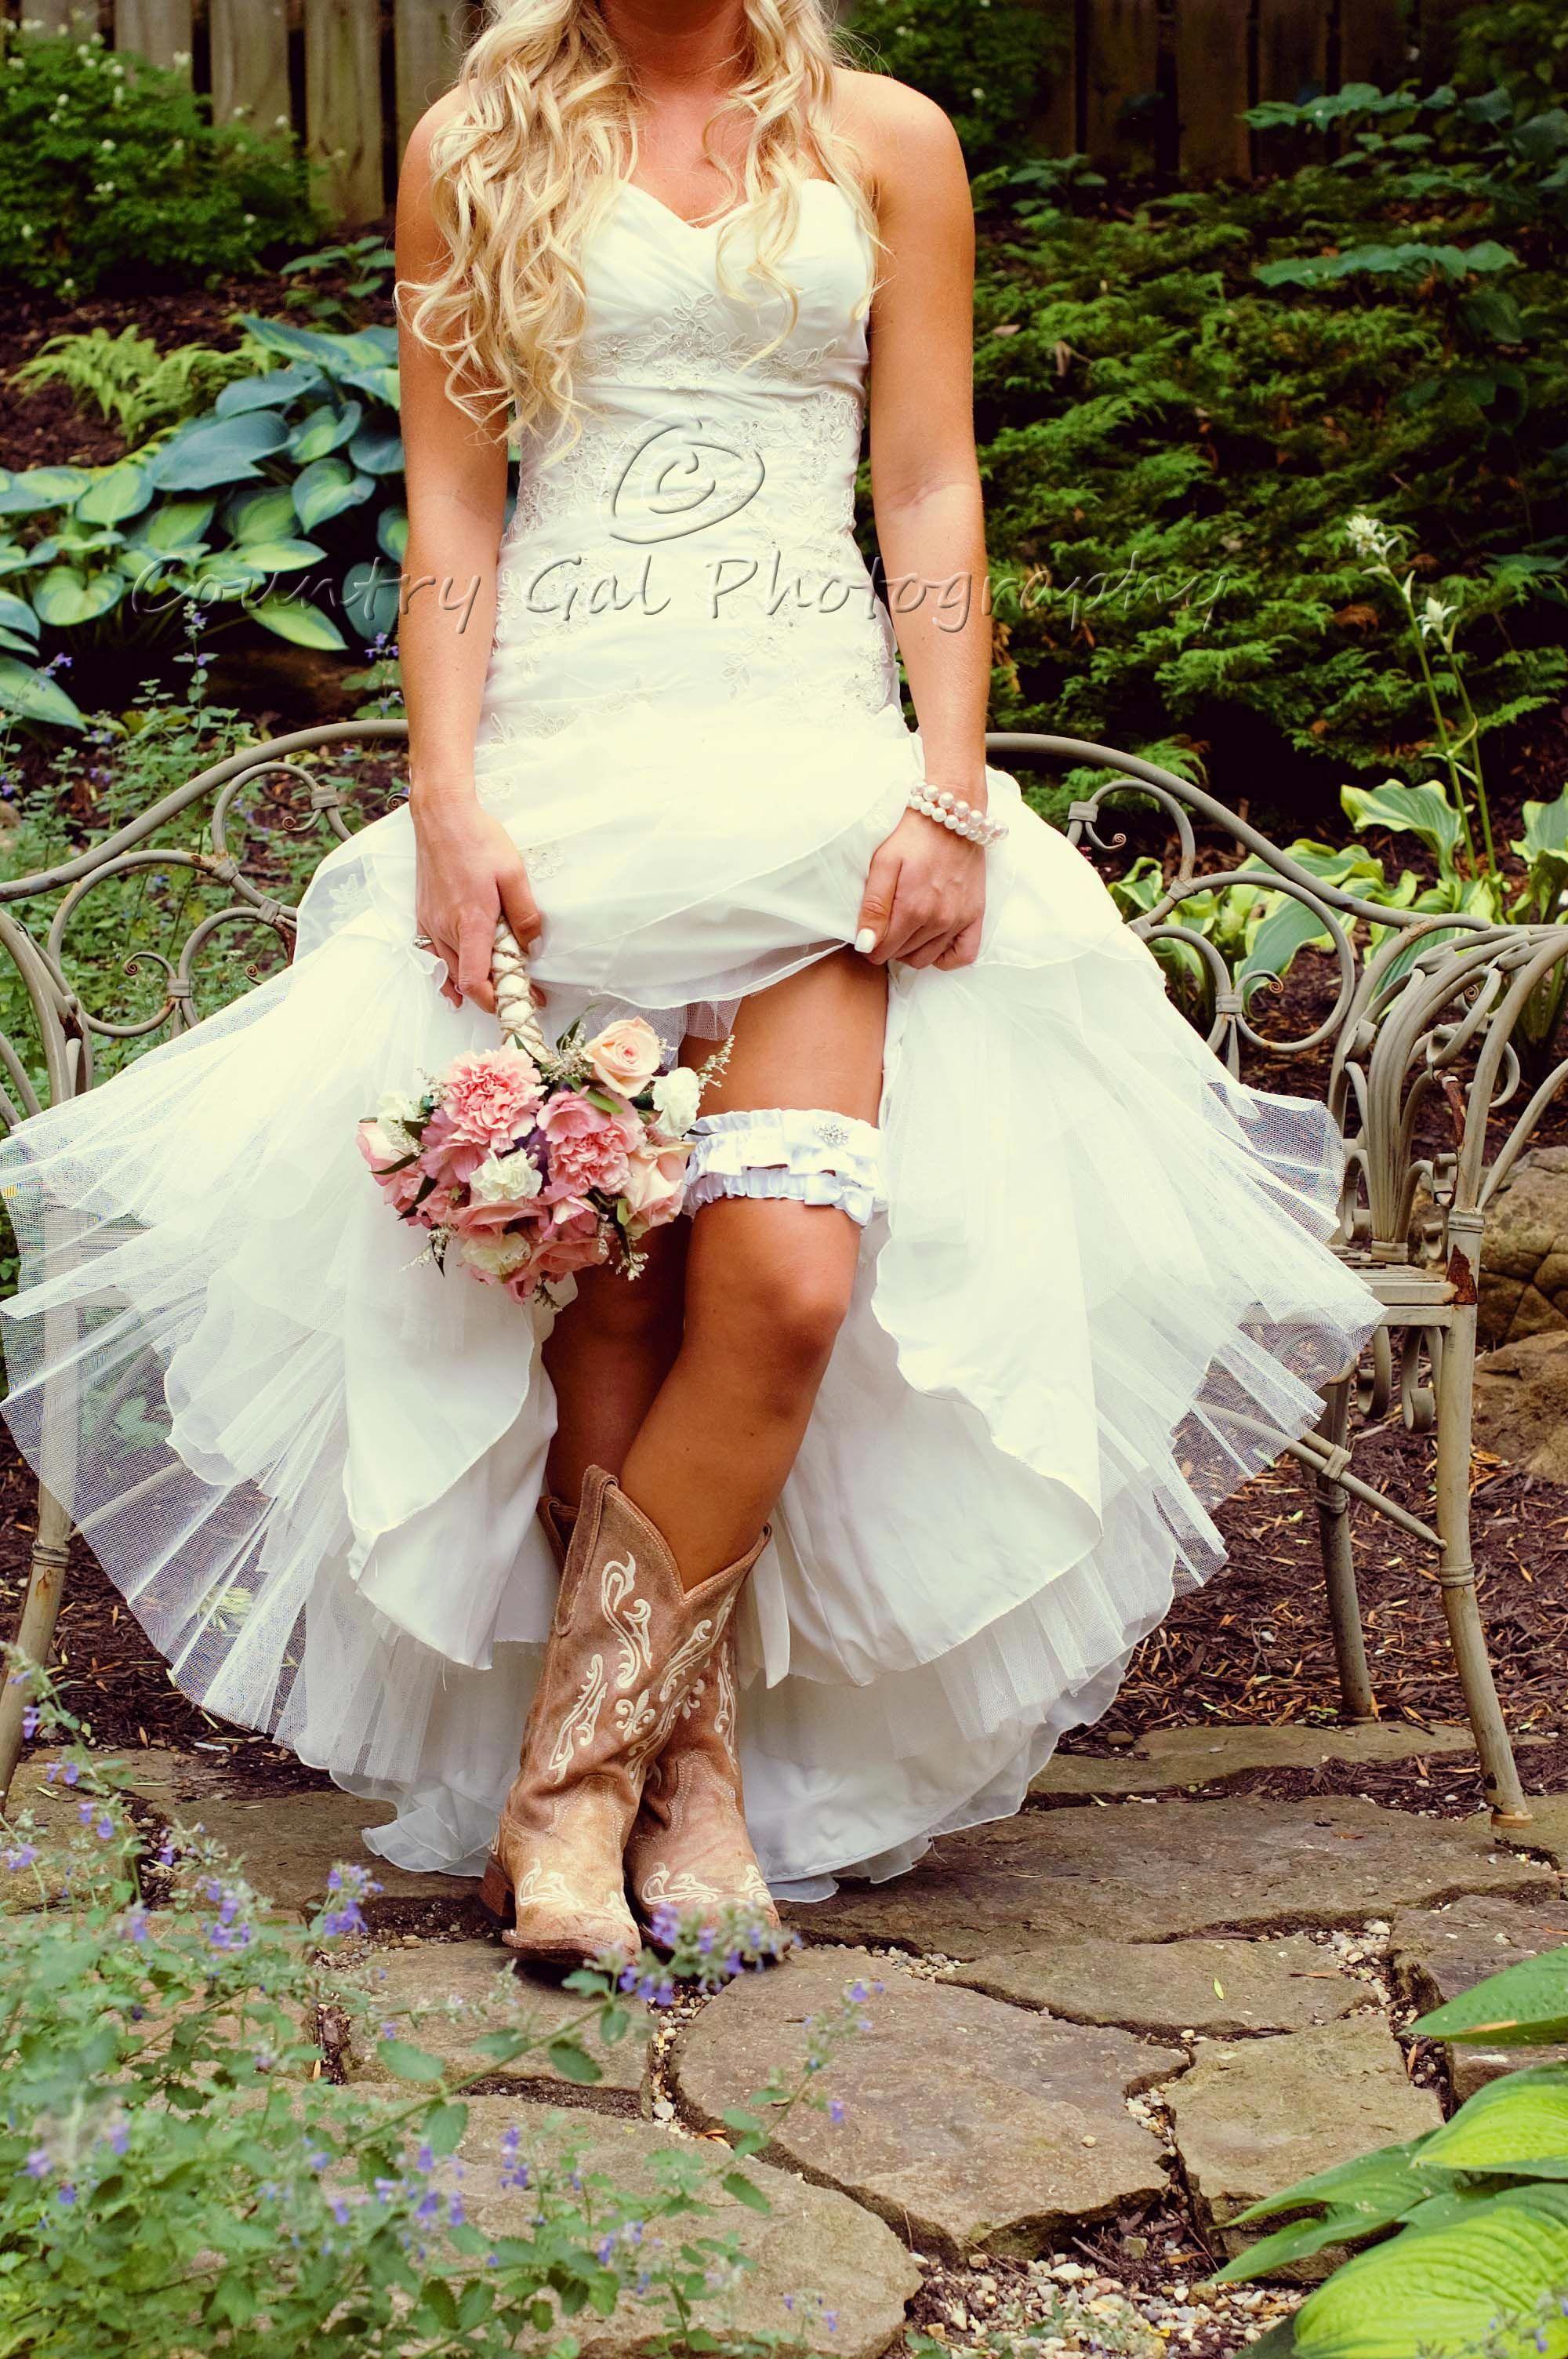 Weddingboots Country Style Wedding Dresses Country Wedding Dresses Country Wedding Photography [ 3008 x 2000 Pixel ]